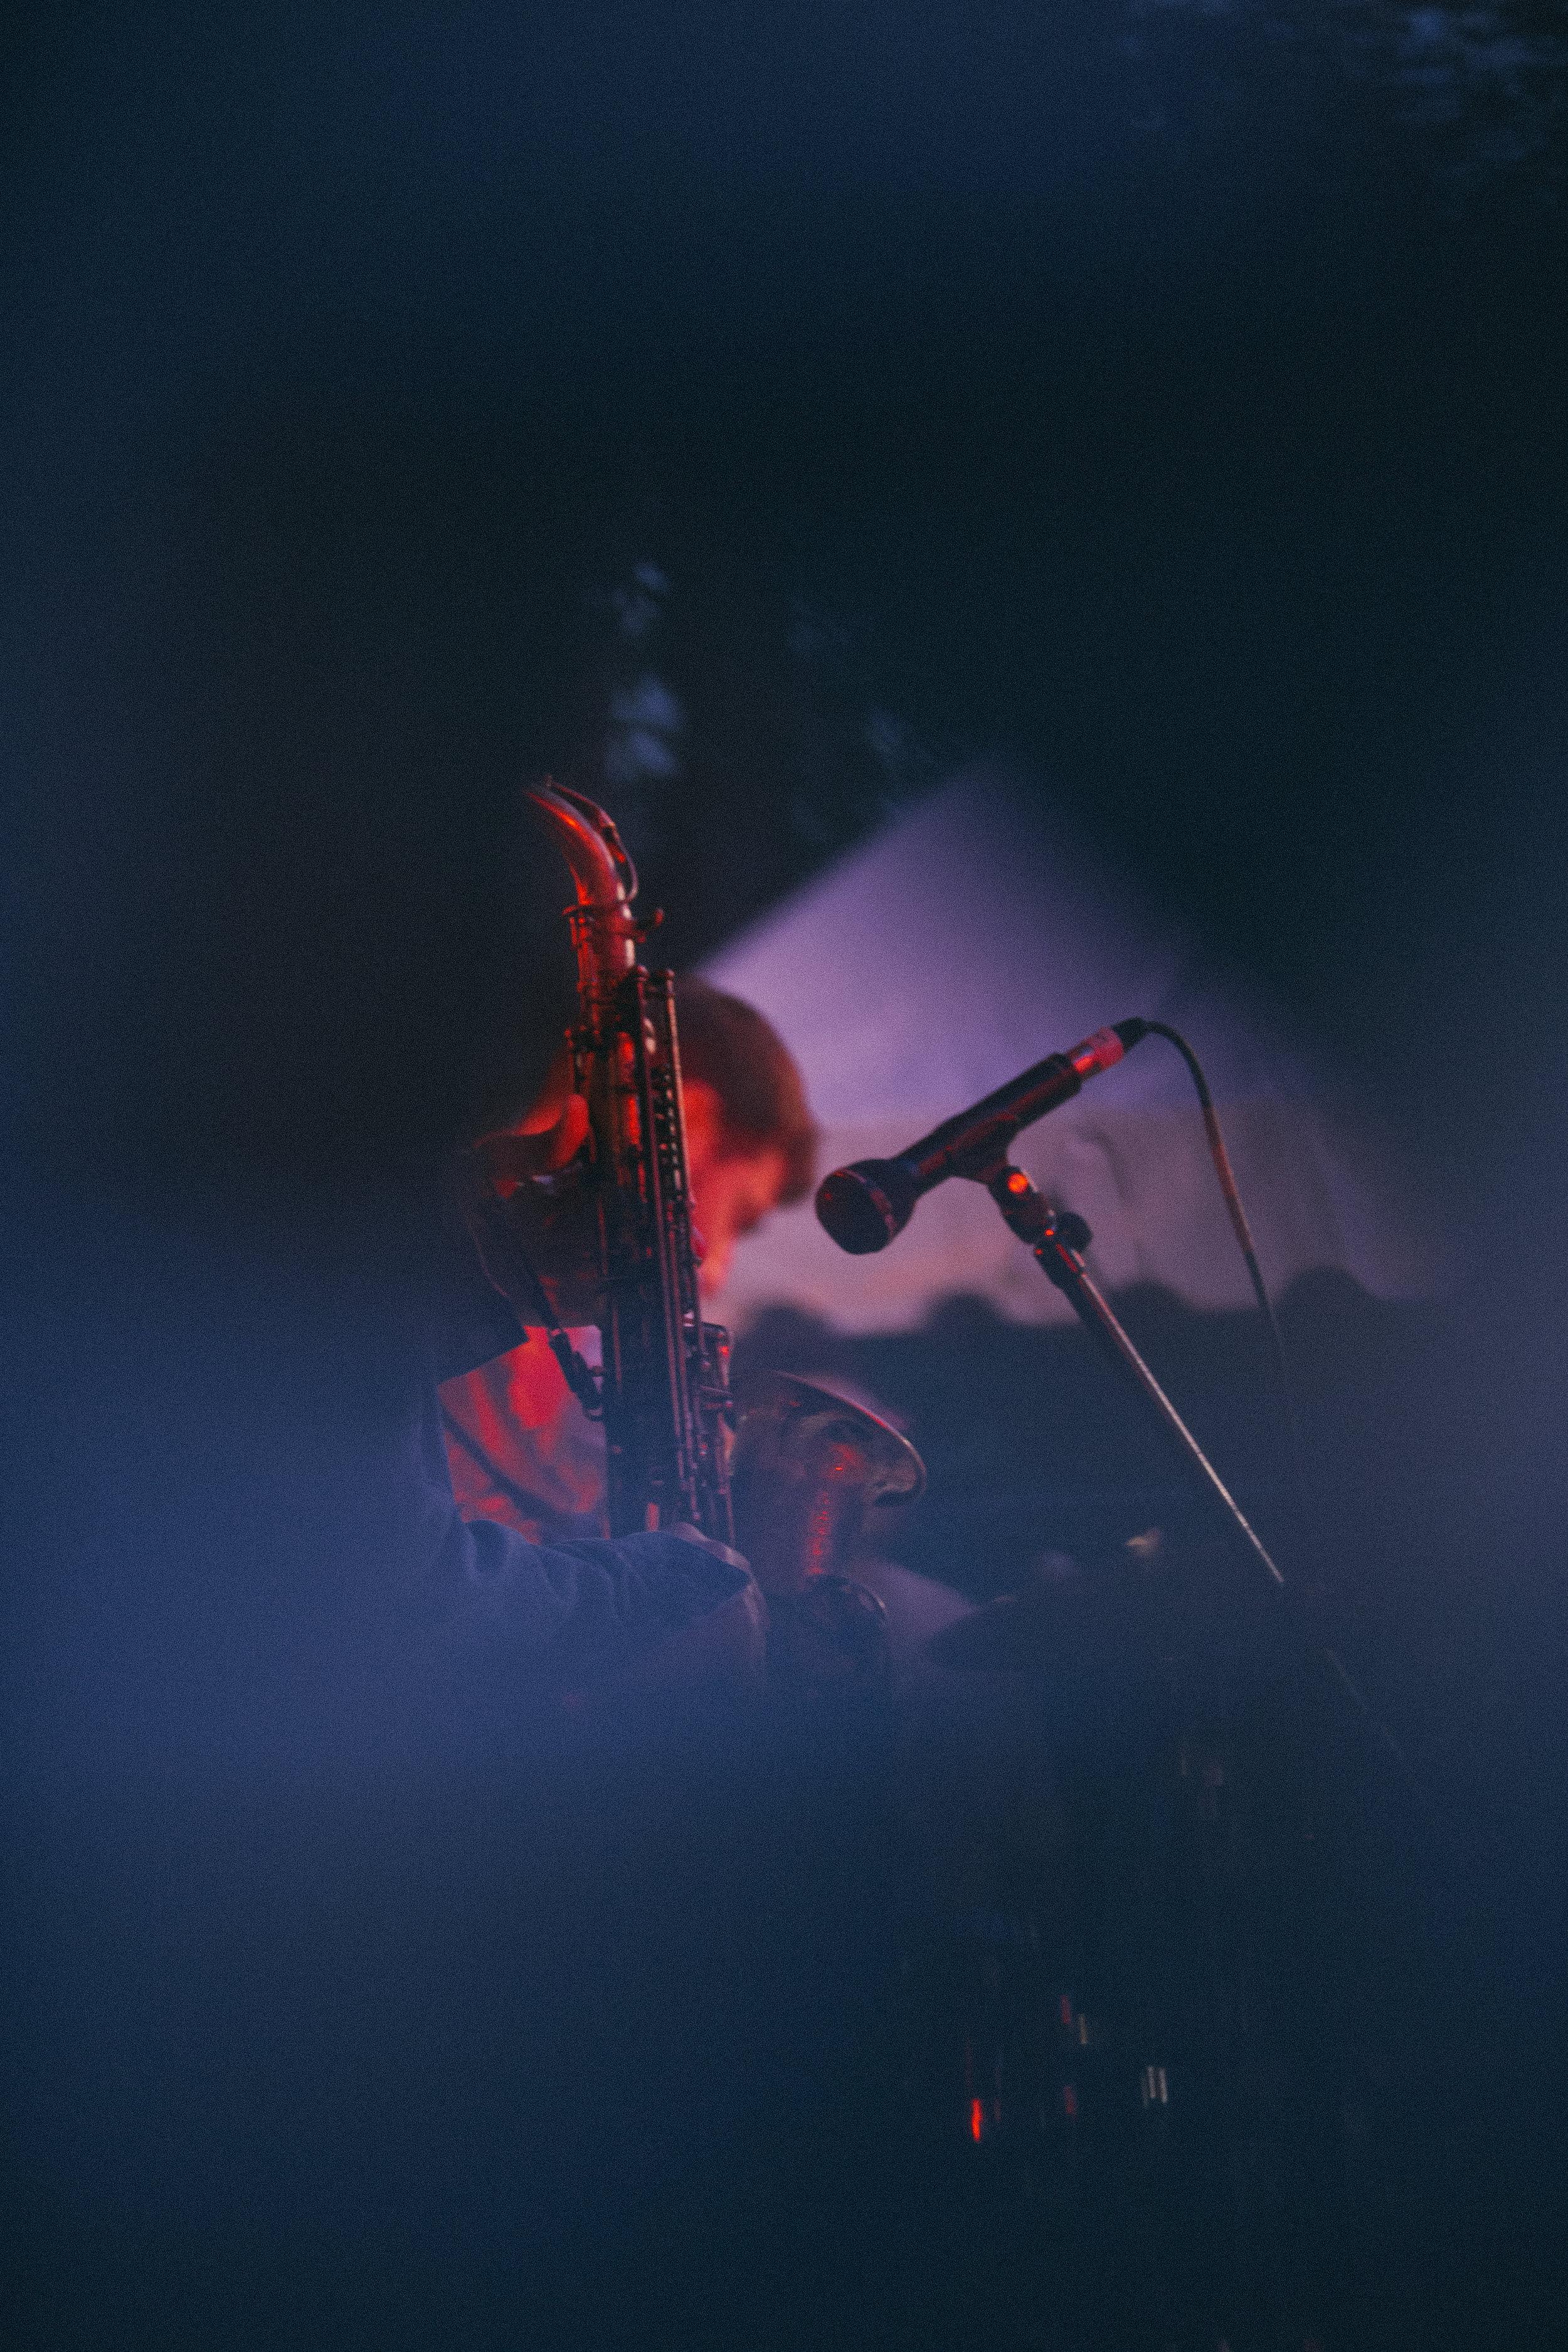 Sun-Jazzfest19-Spaces and faces_byJenDoerksenPhoto-3.jpg